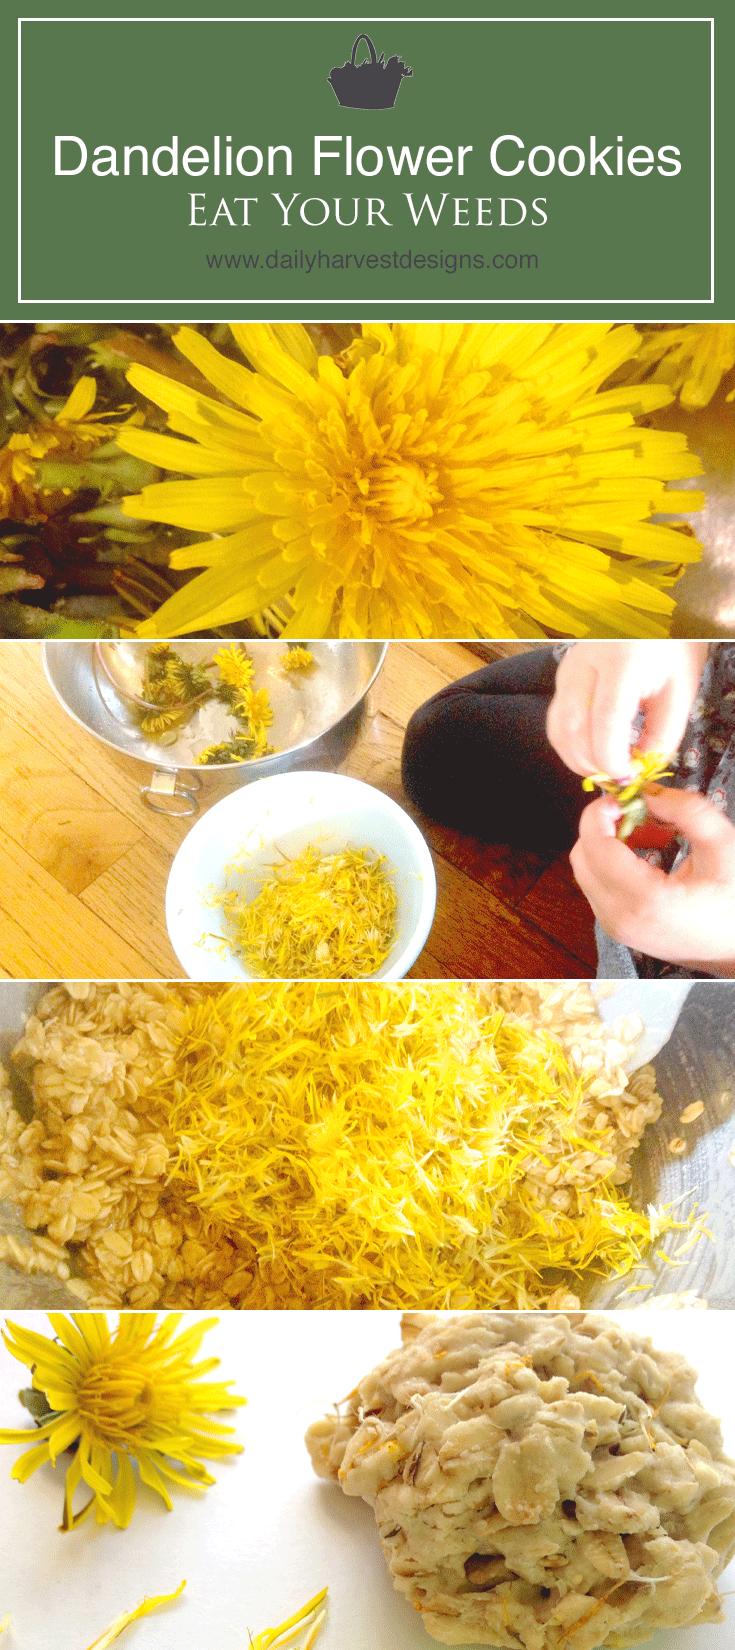 How To Make My Favorite Dandelion Flower Cookies Dandelion Recipes Recipes Food